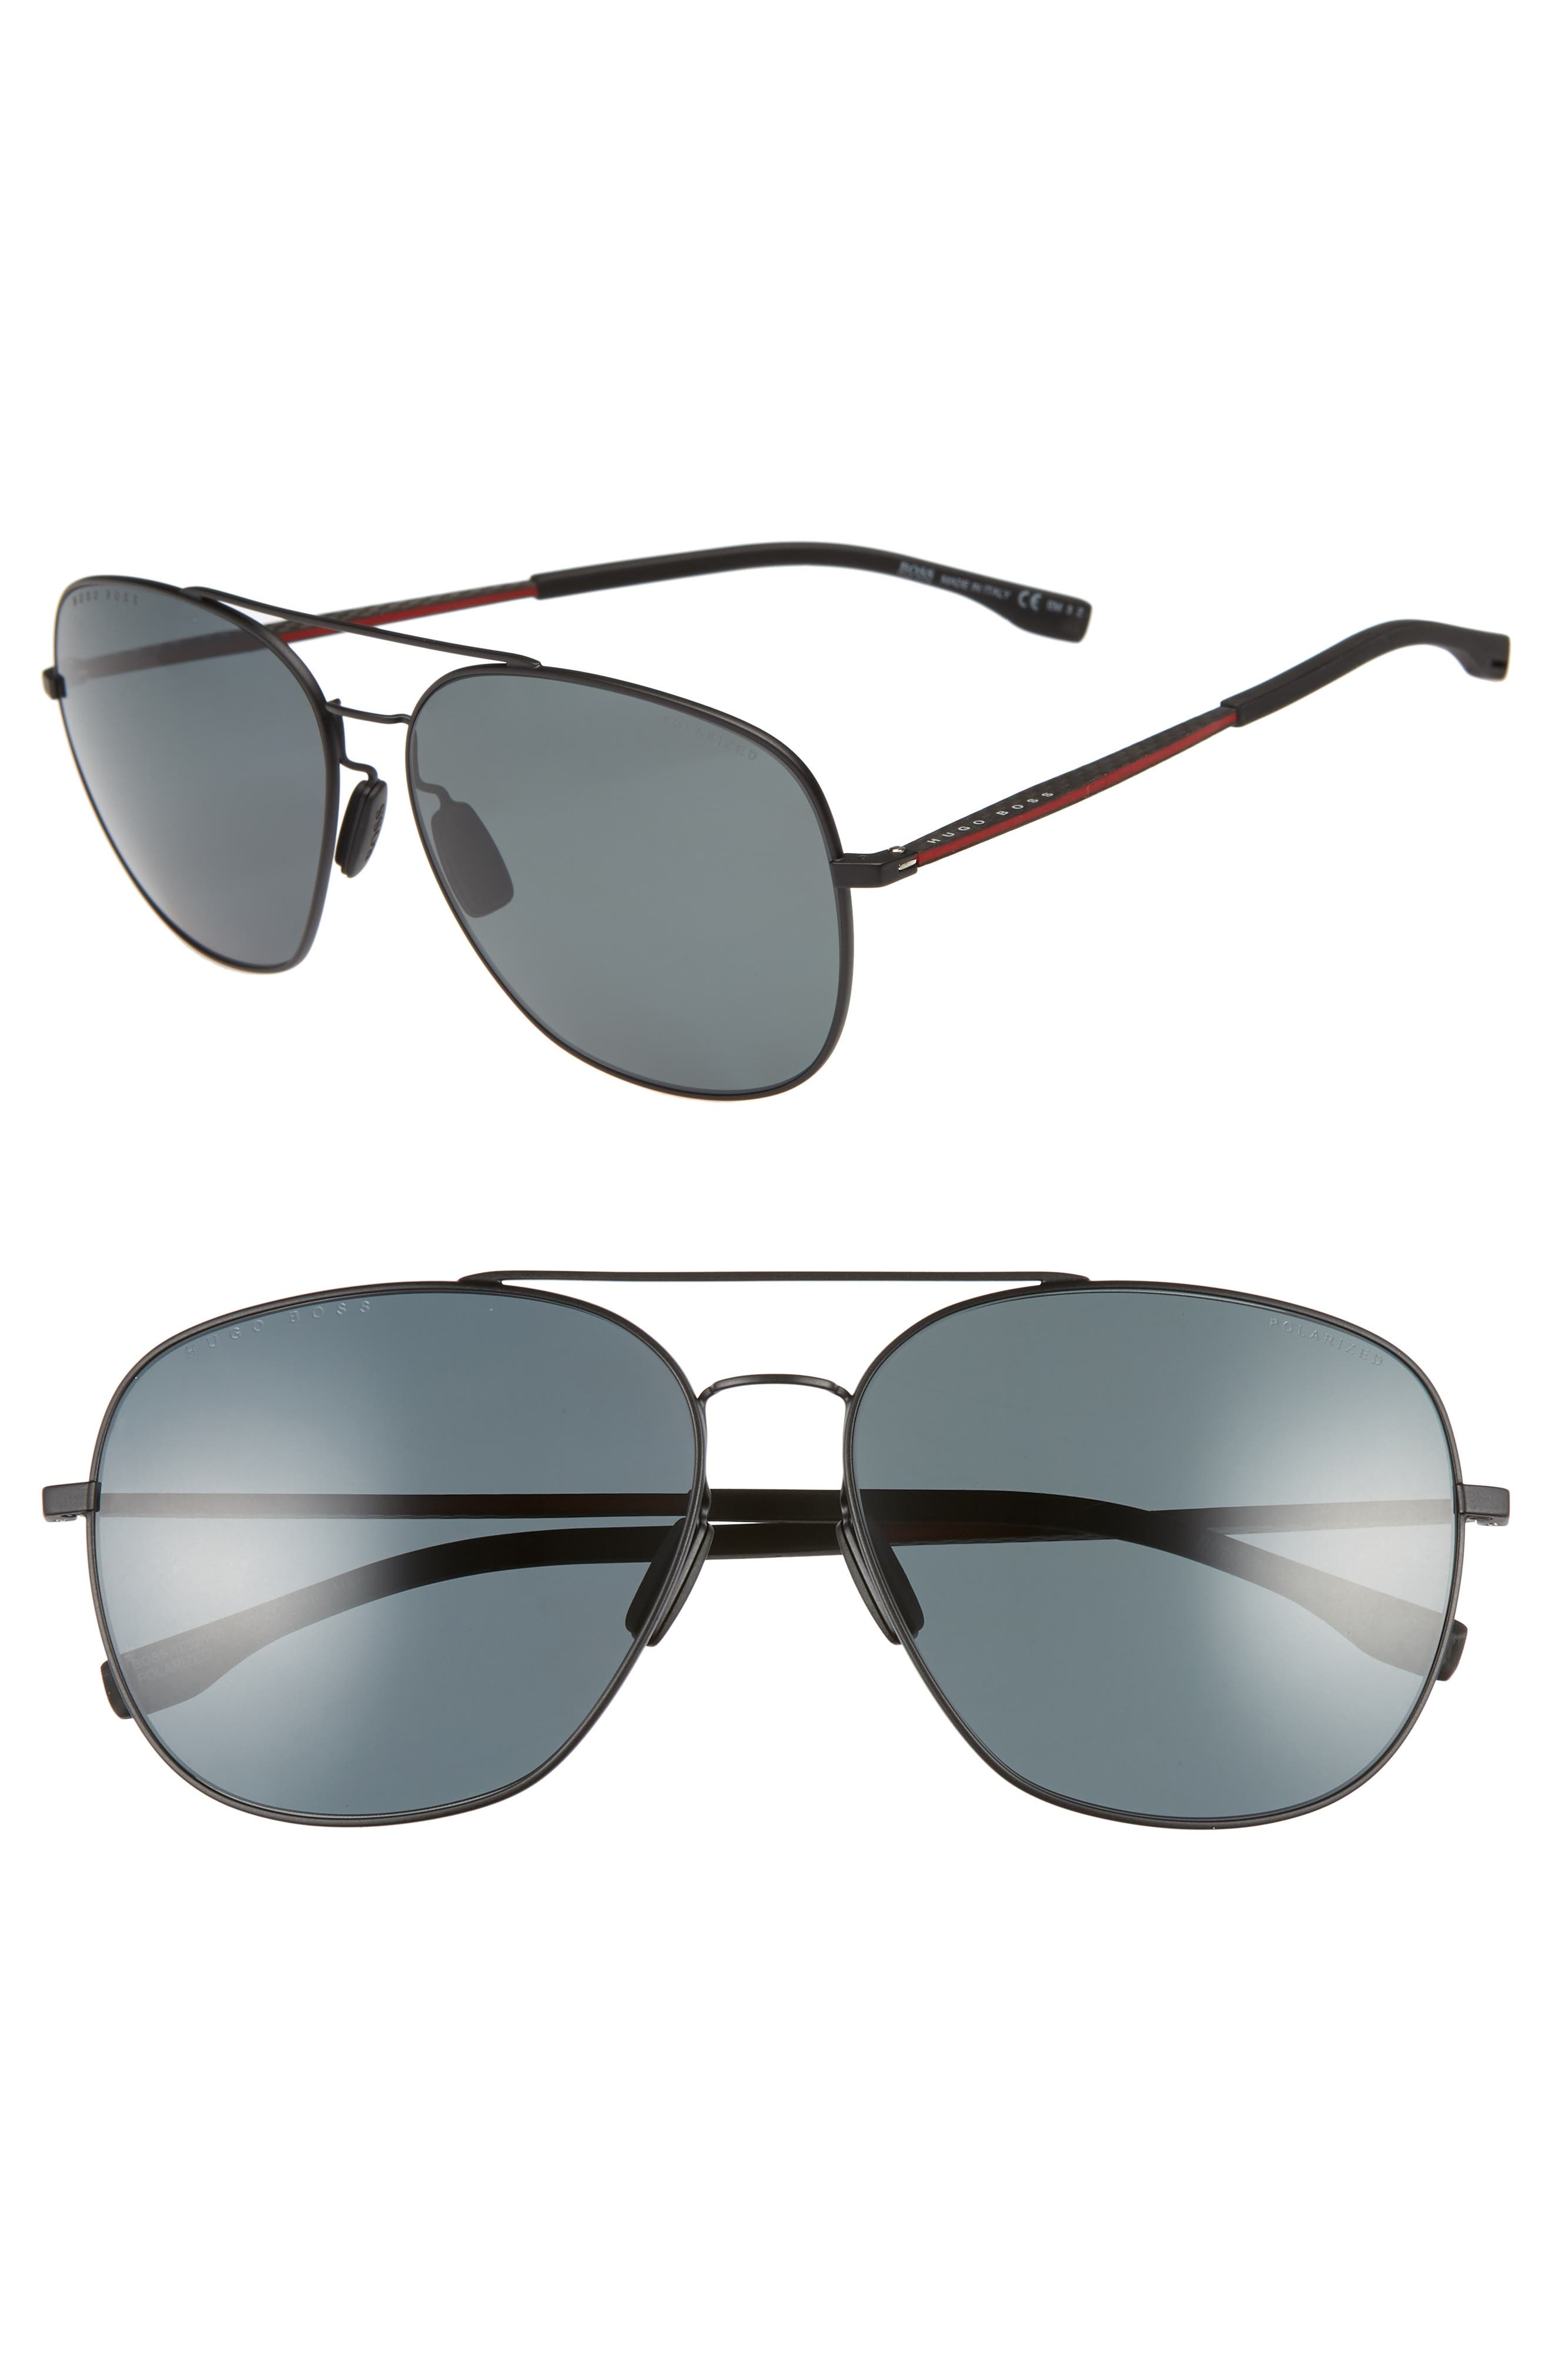 62mm Polarized Special Fit Aviator Sunglasses,                             Main thumbnail 1, color,                             MATTE BLACK